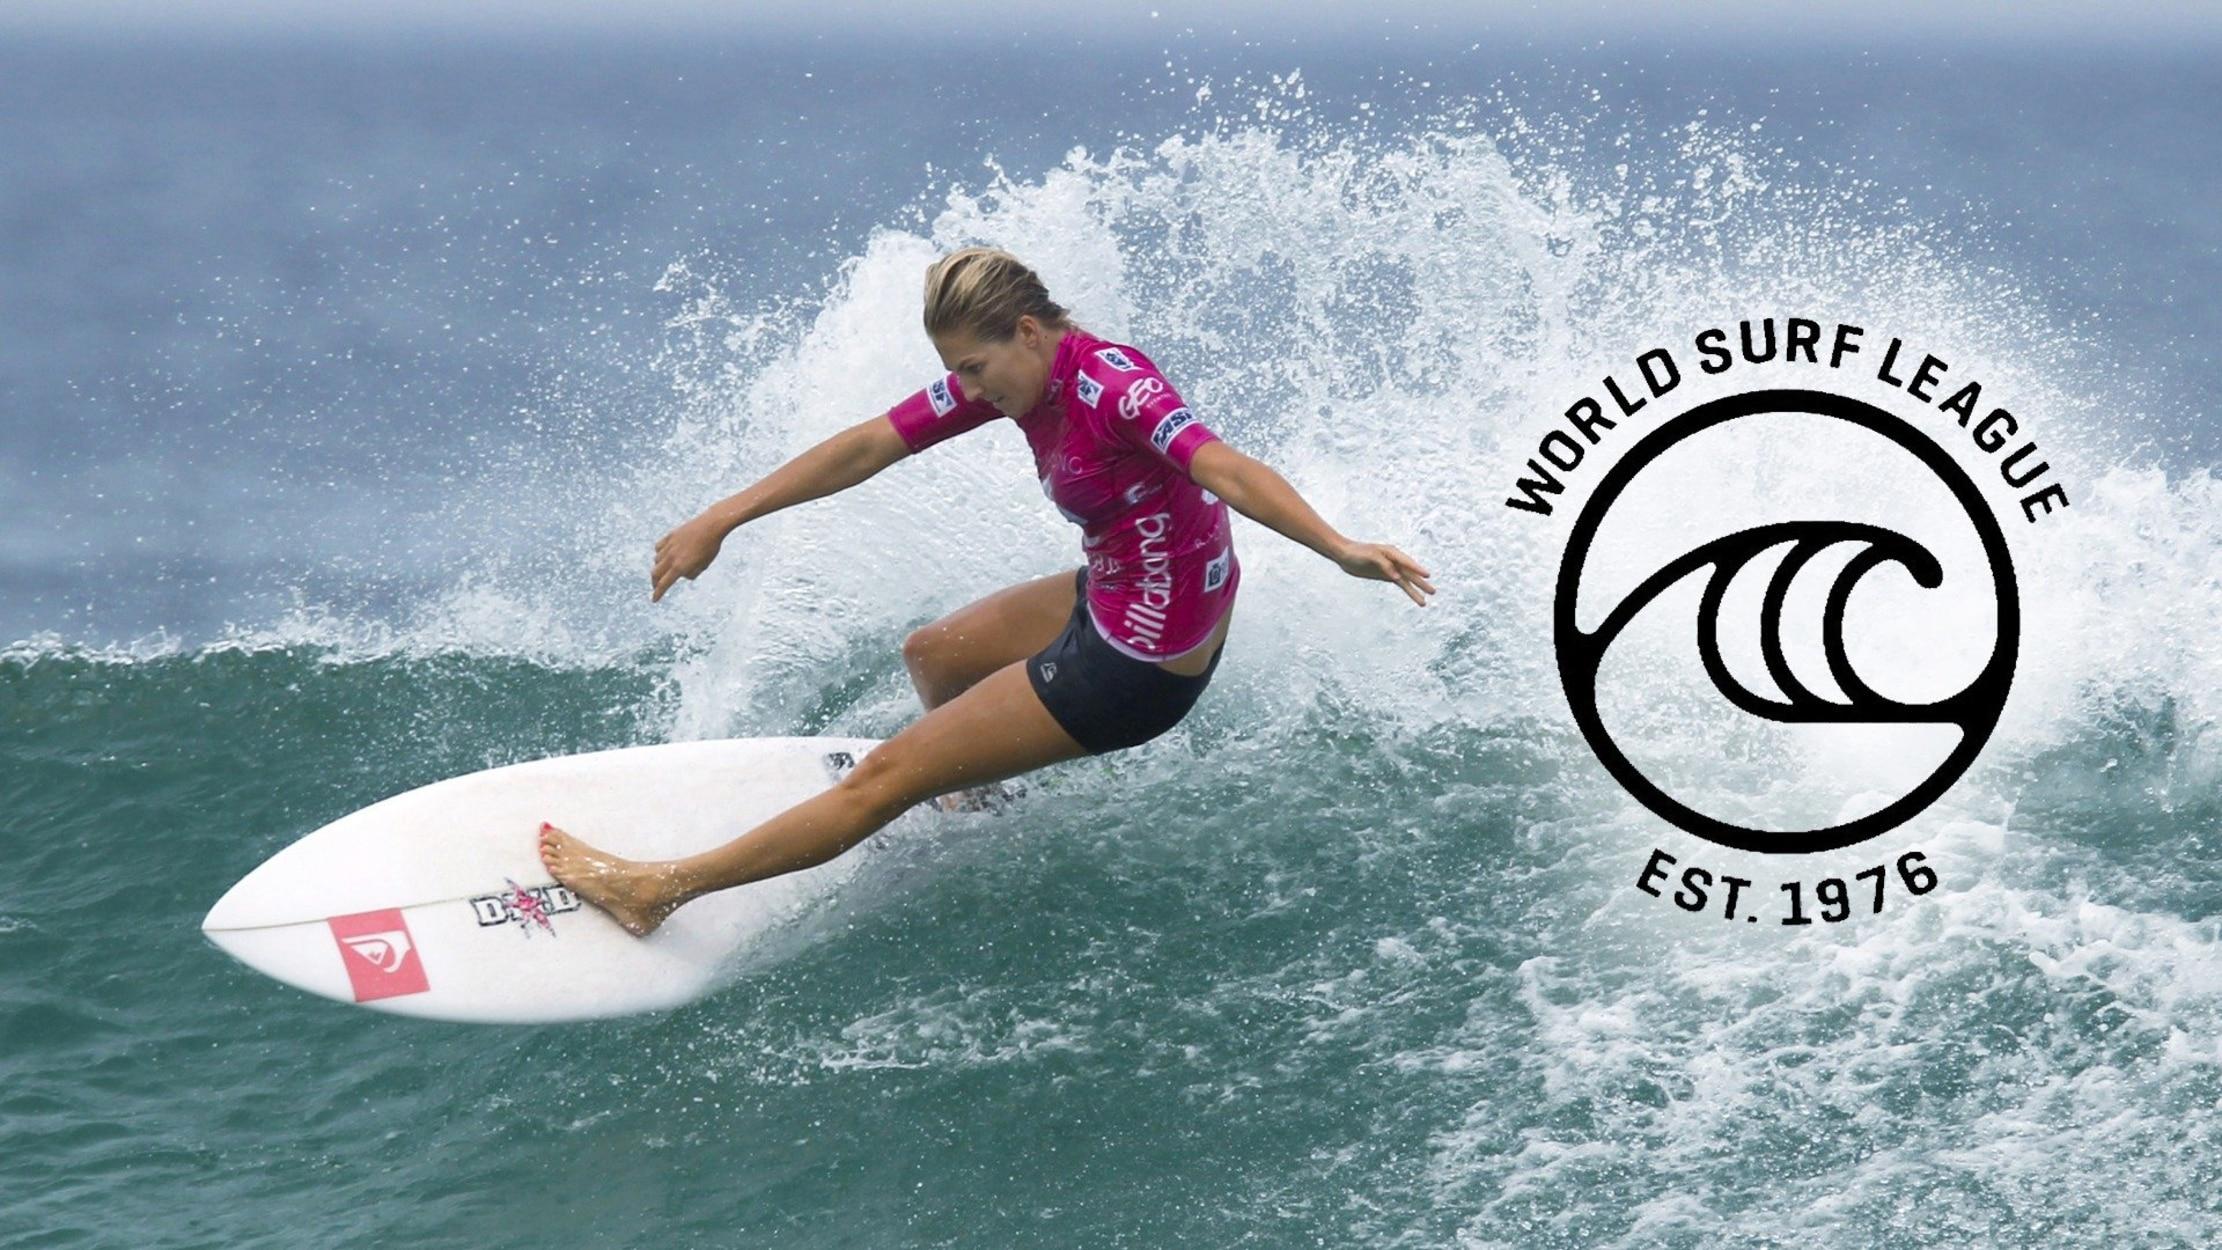 World Surf League Presents seriesDetail